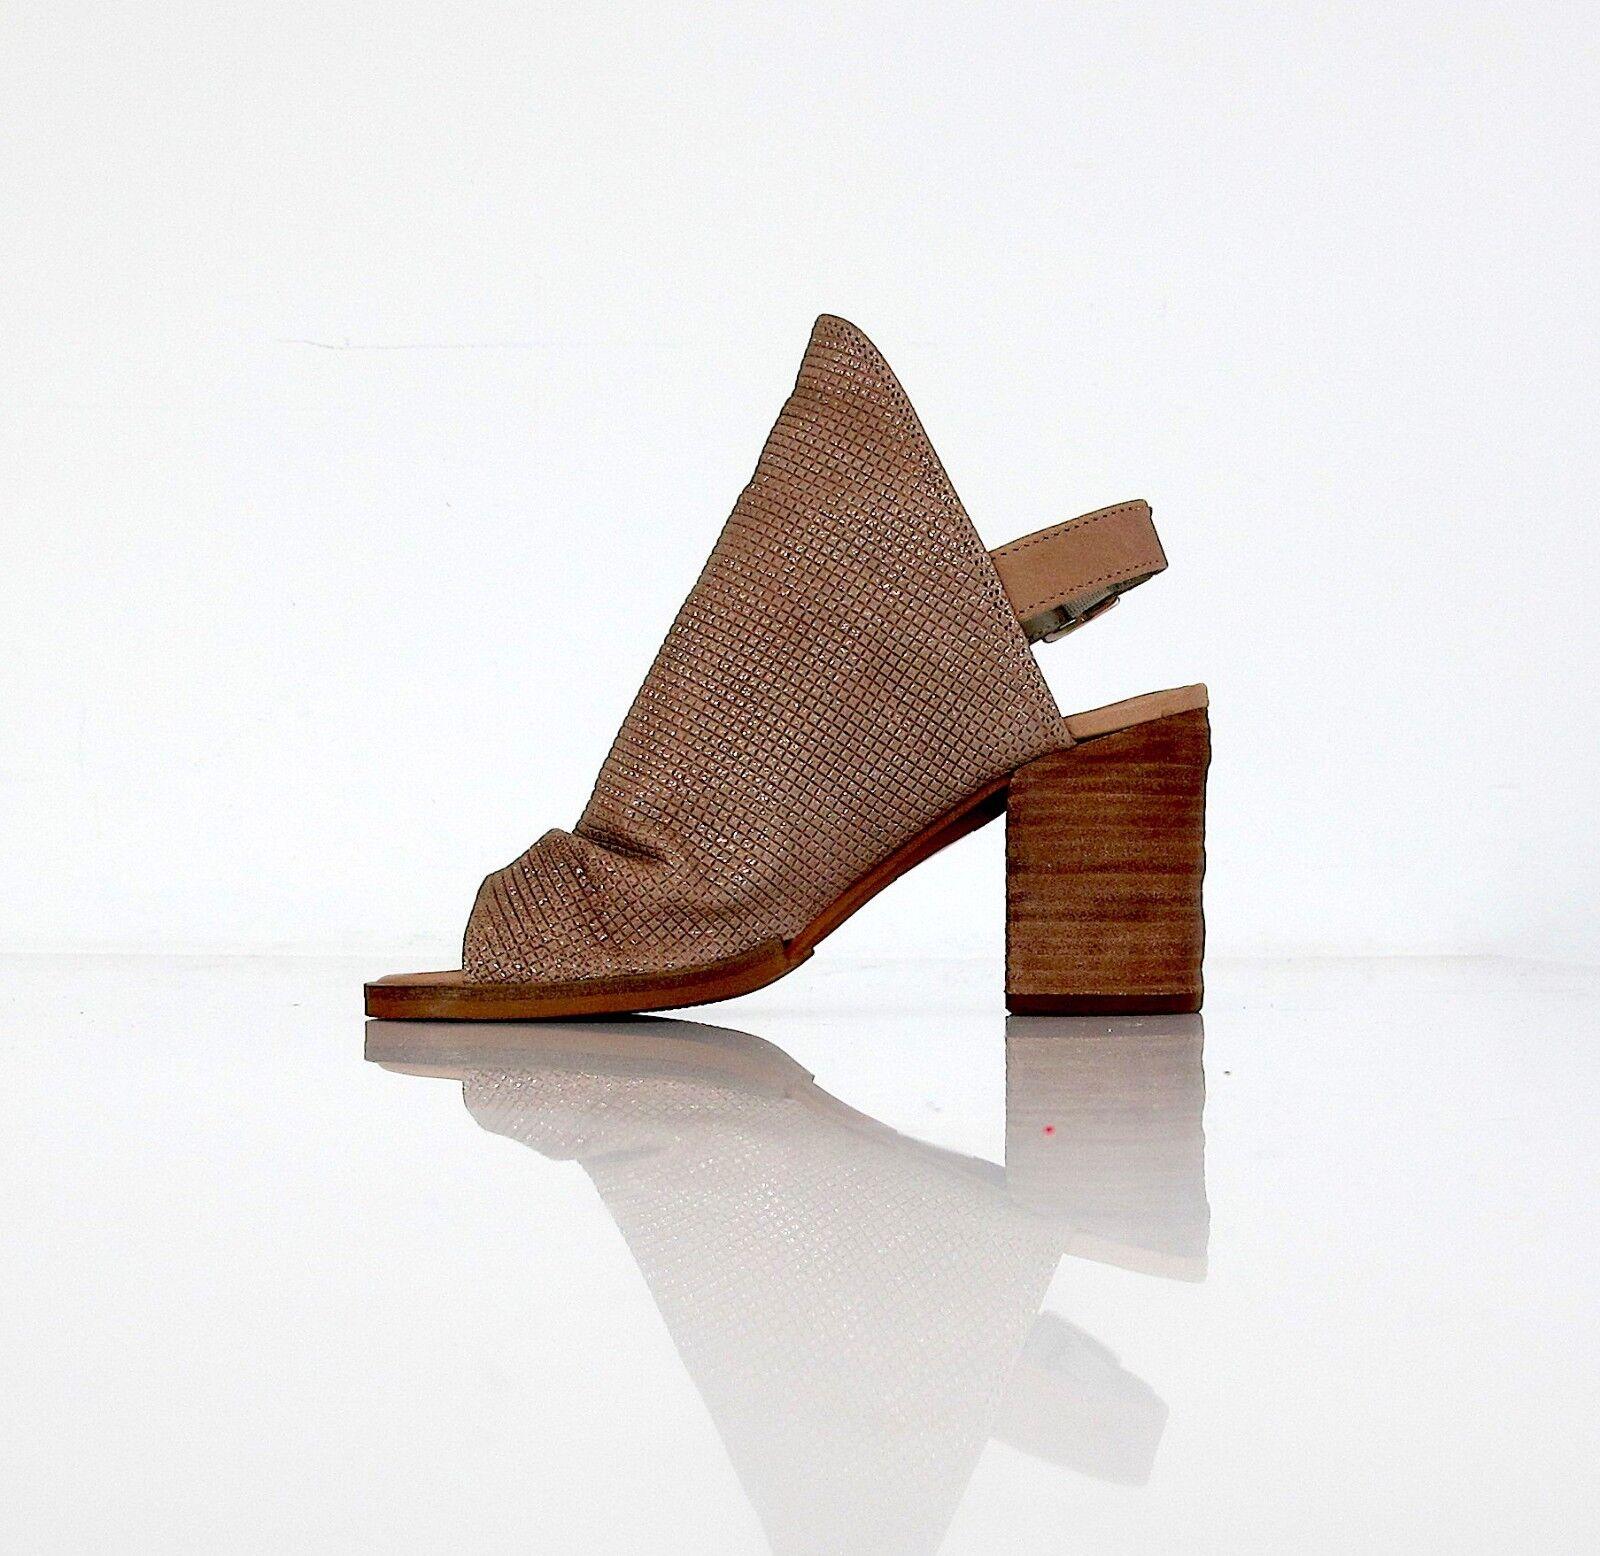 FABBRICA FABBRICA FABBRICA DEI COLLI sandali  a 1CLOUD1001 col.BEIGE METALLIZZATO estate 2018 1375a3